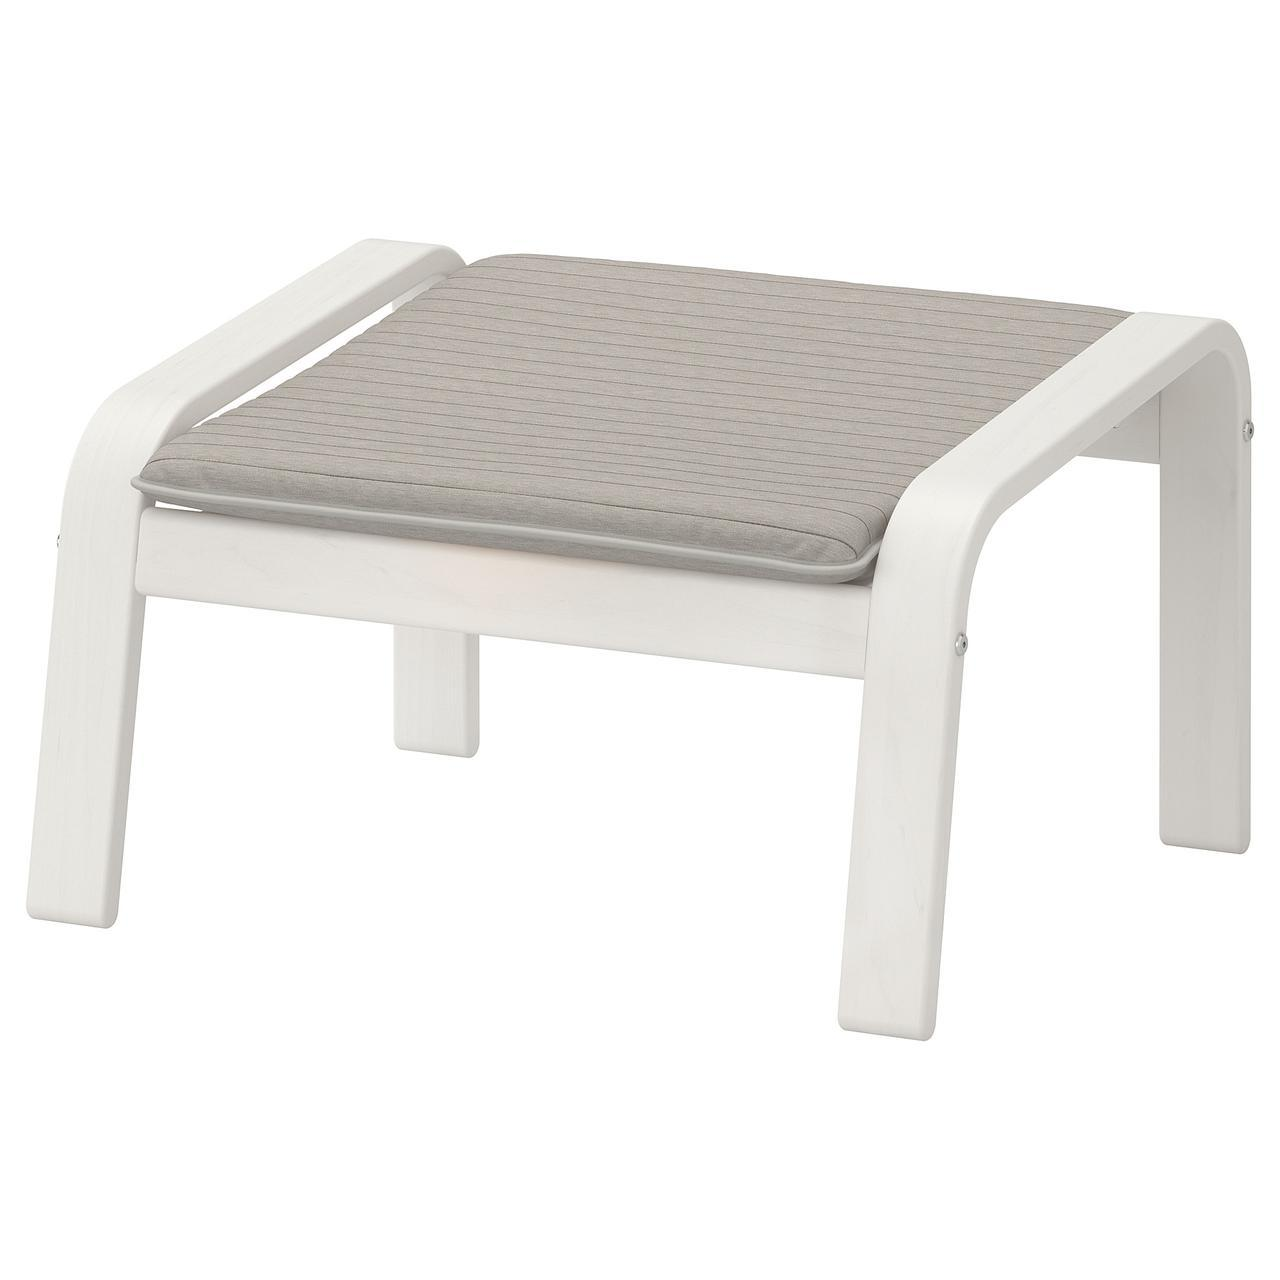 IKEA POANG Подставка для ног, белый, Книса светло-бежевый  (892.446.98)